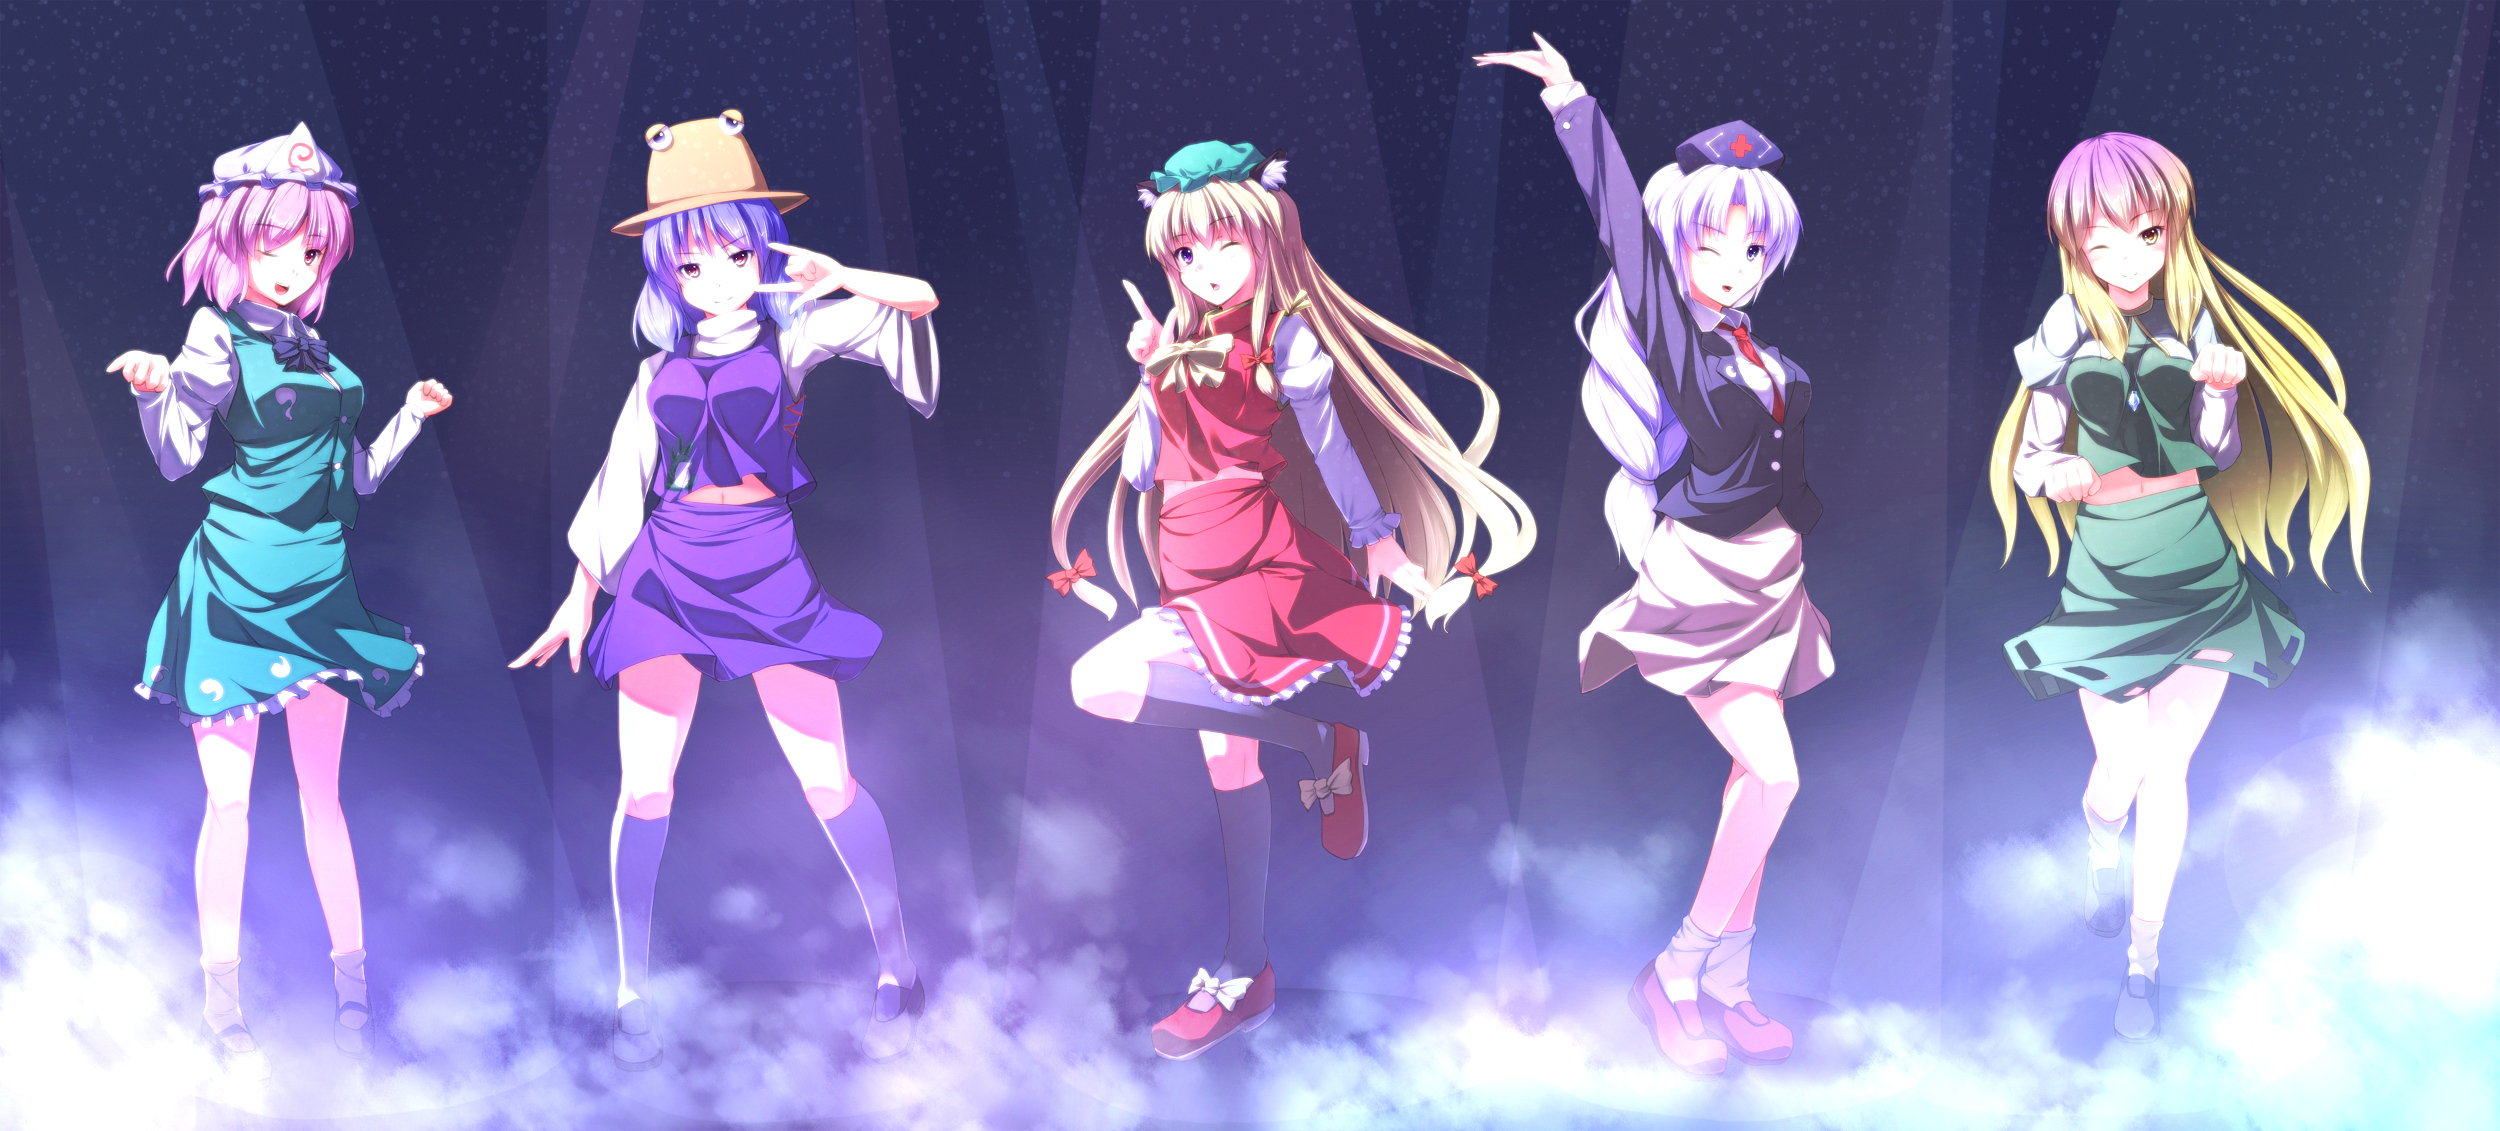 Neko Girl Live Wallpaper Touhou Wallpaper Pack 08 04 2012